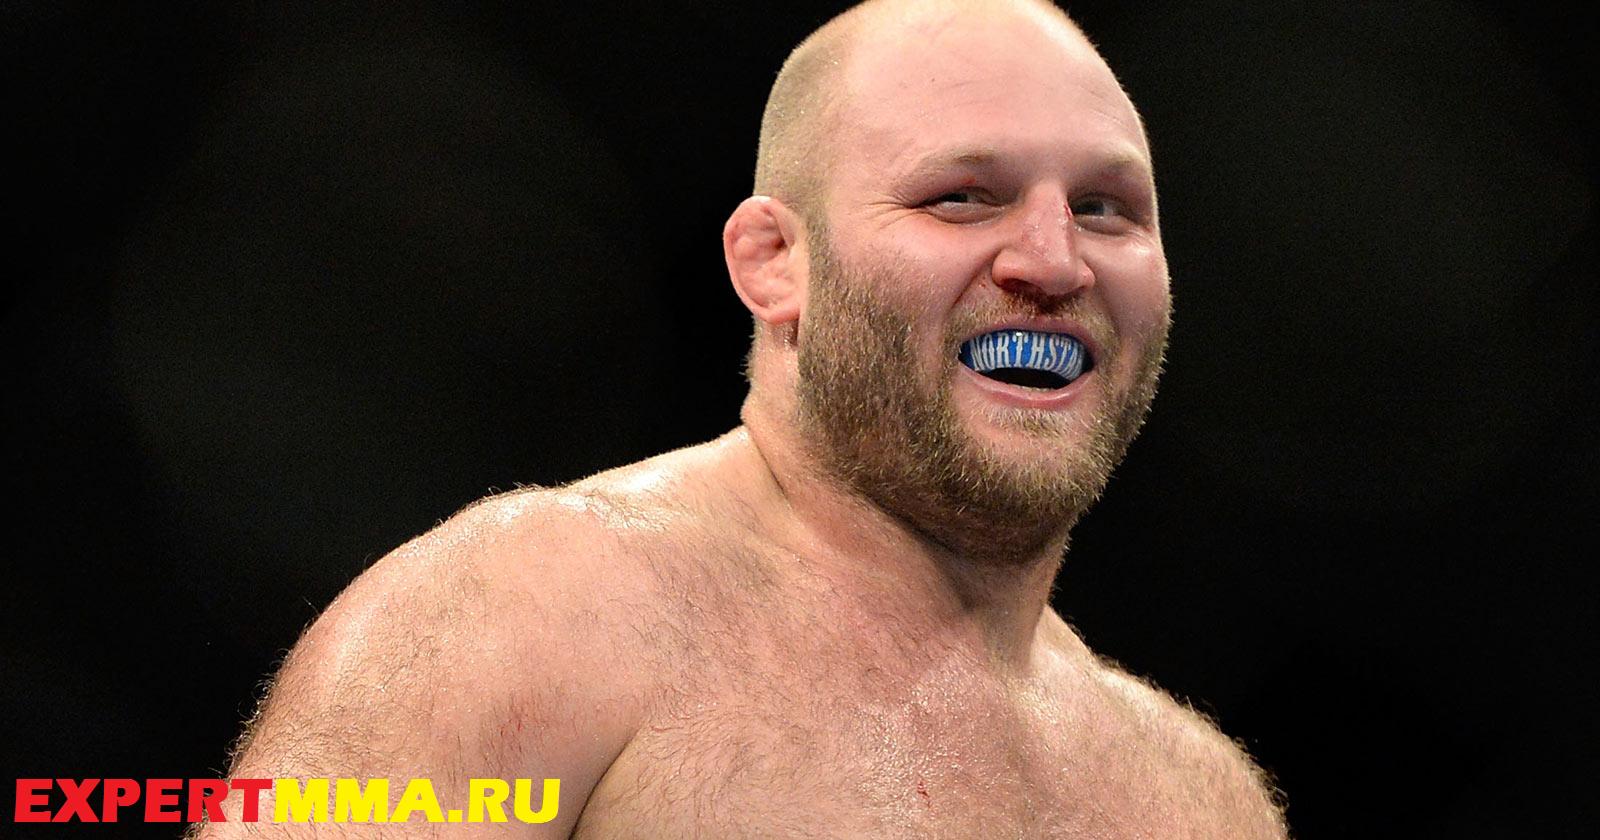 090314_UFC_Ben_Rothwell_celebrates_after_defeating_Brandon_Vera_PI_.jpg